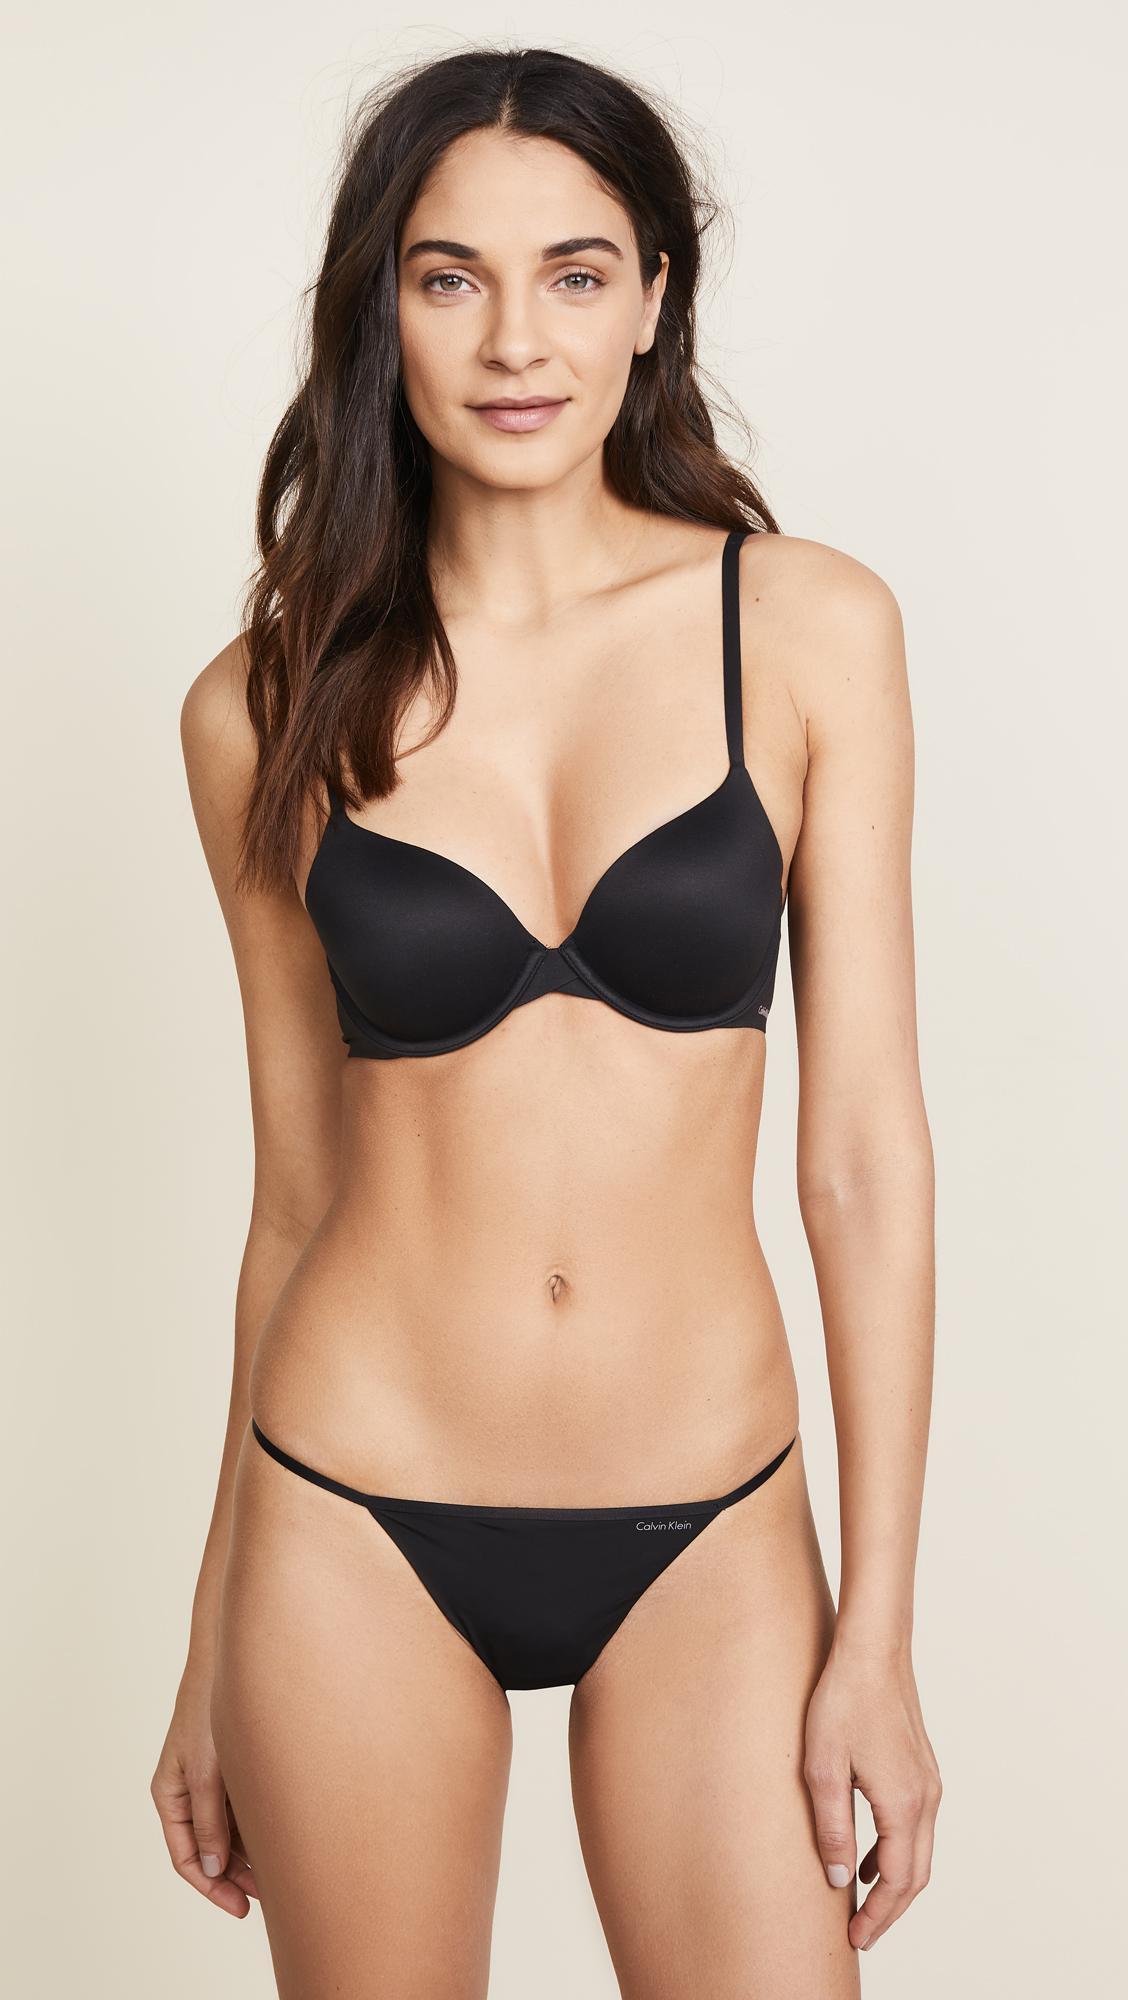 174fdd4acc76f Calvin Klein - Black Perfectly Fit Modern T-shirt Bra - Lyst. View  fullscreen